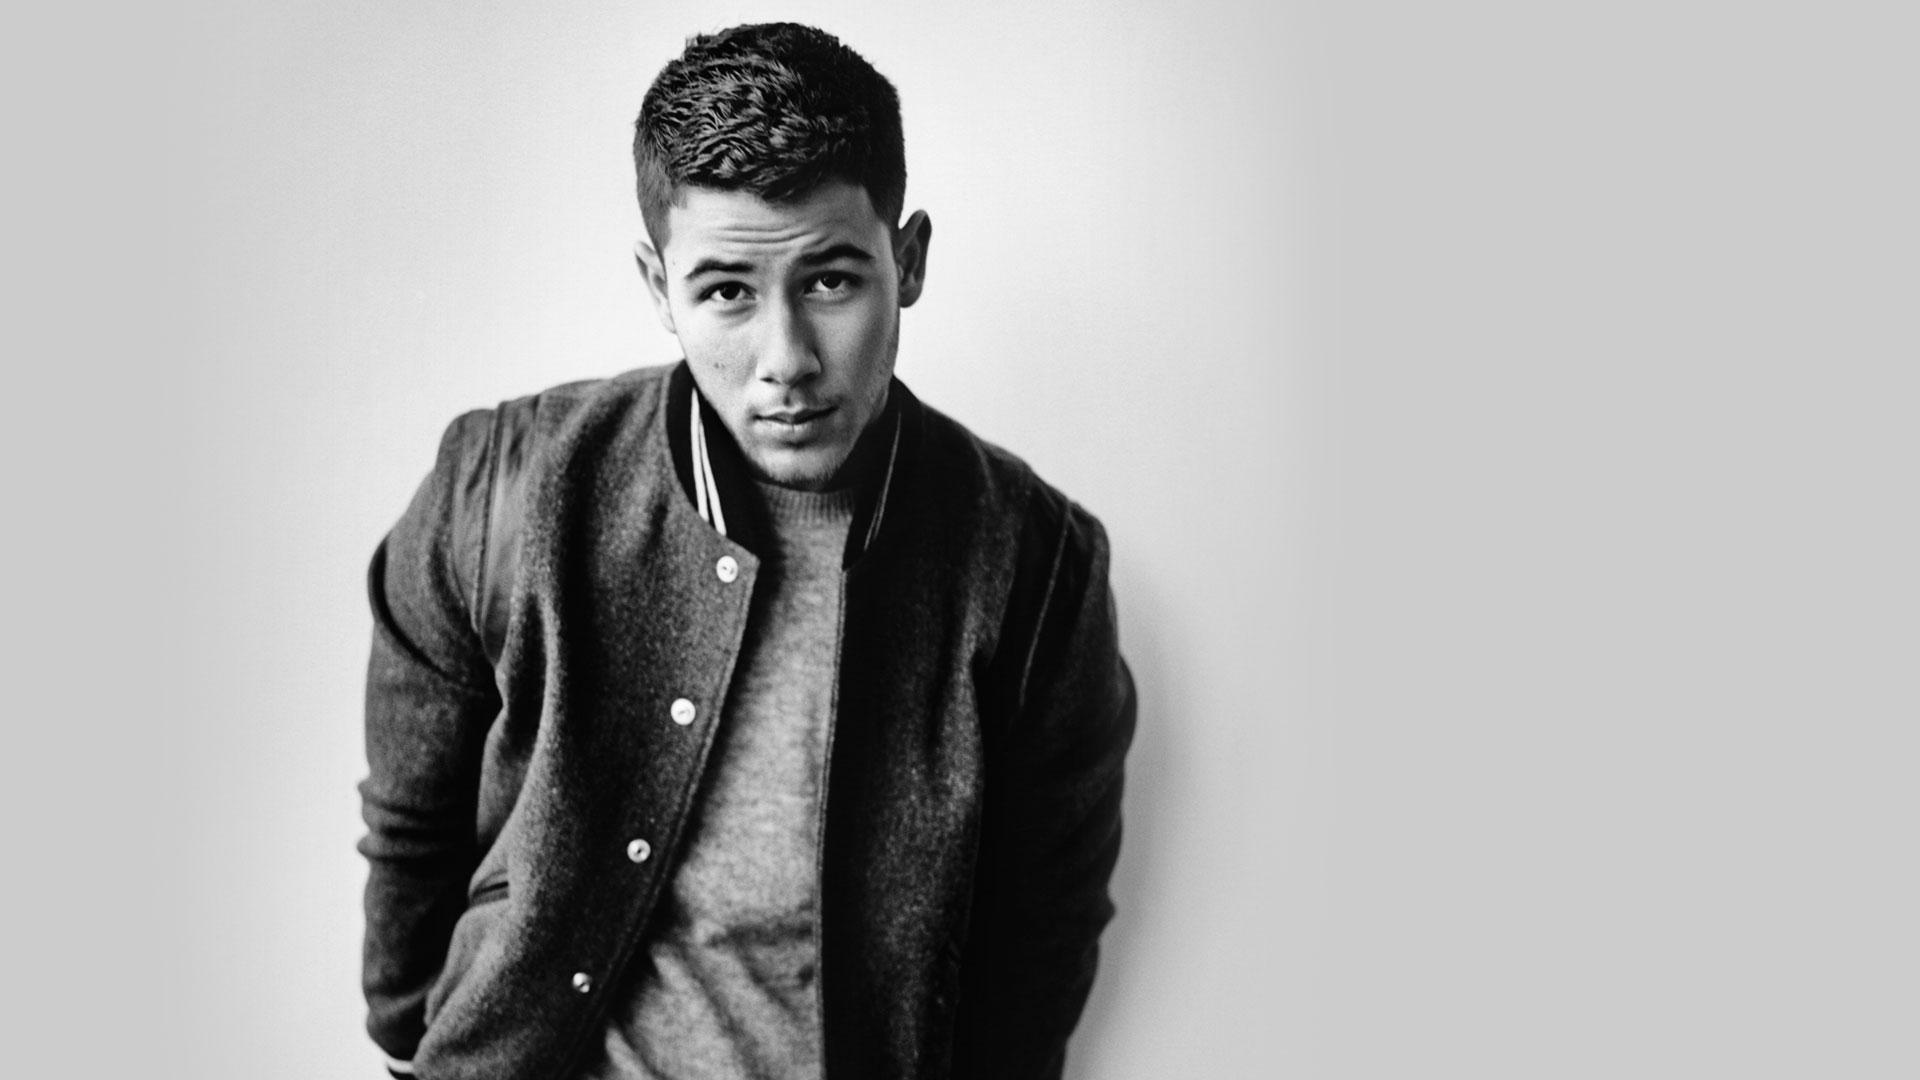 Nick Jonas Backgrounds Wallpaper